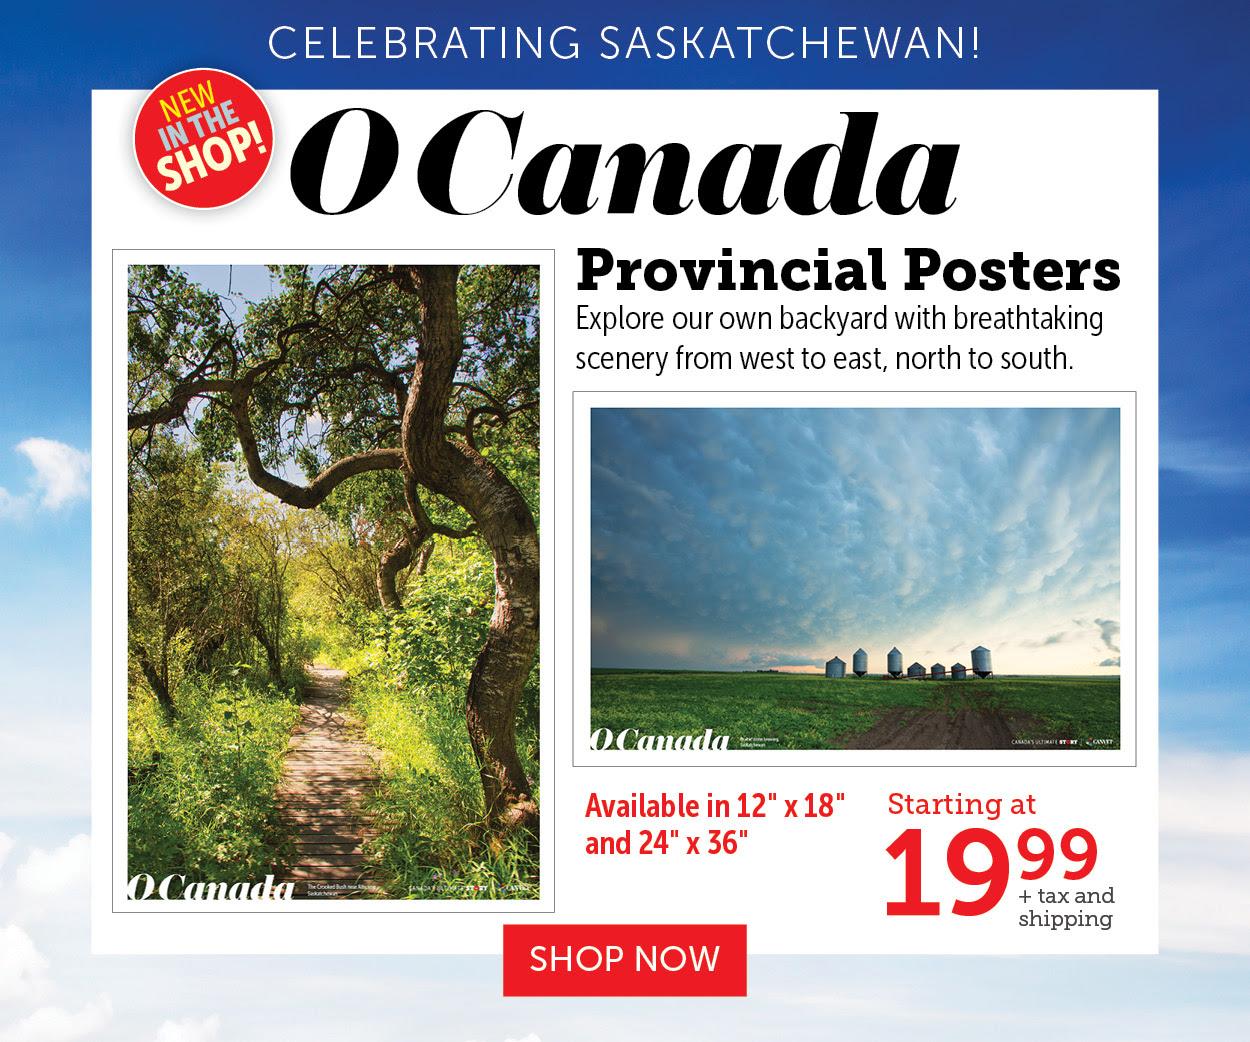 O Canada Provincial Posters